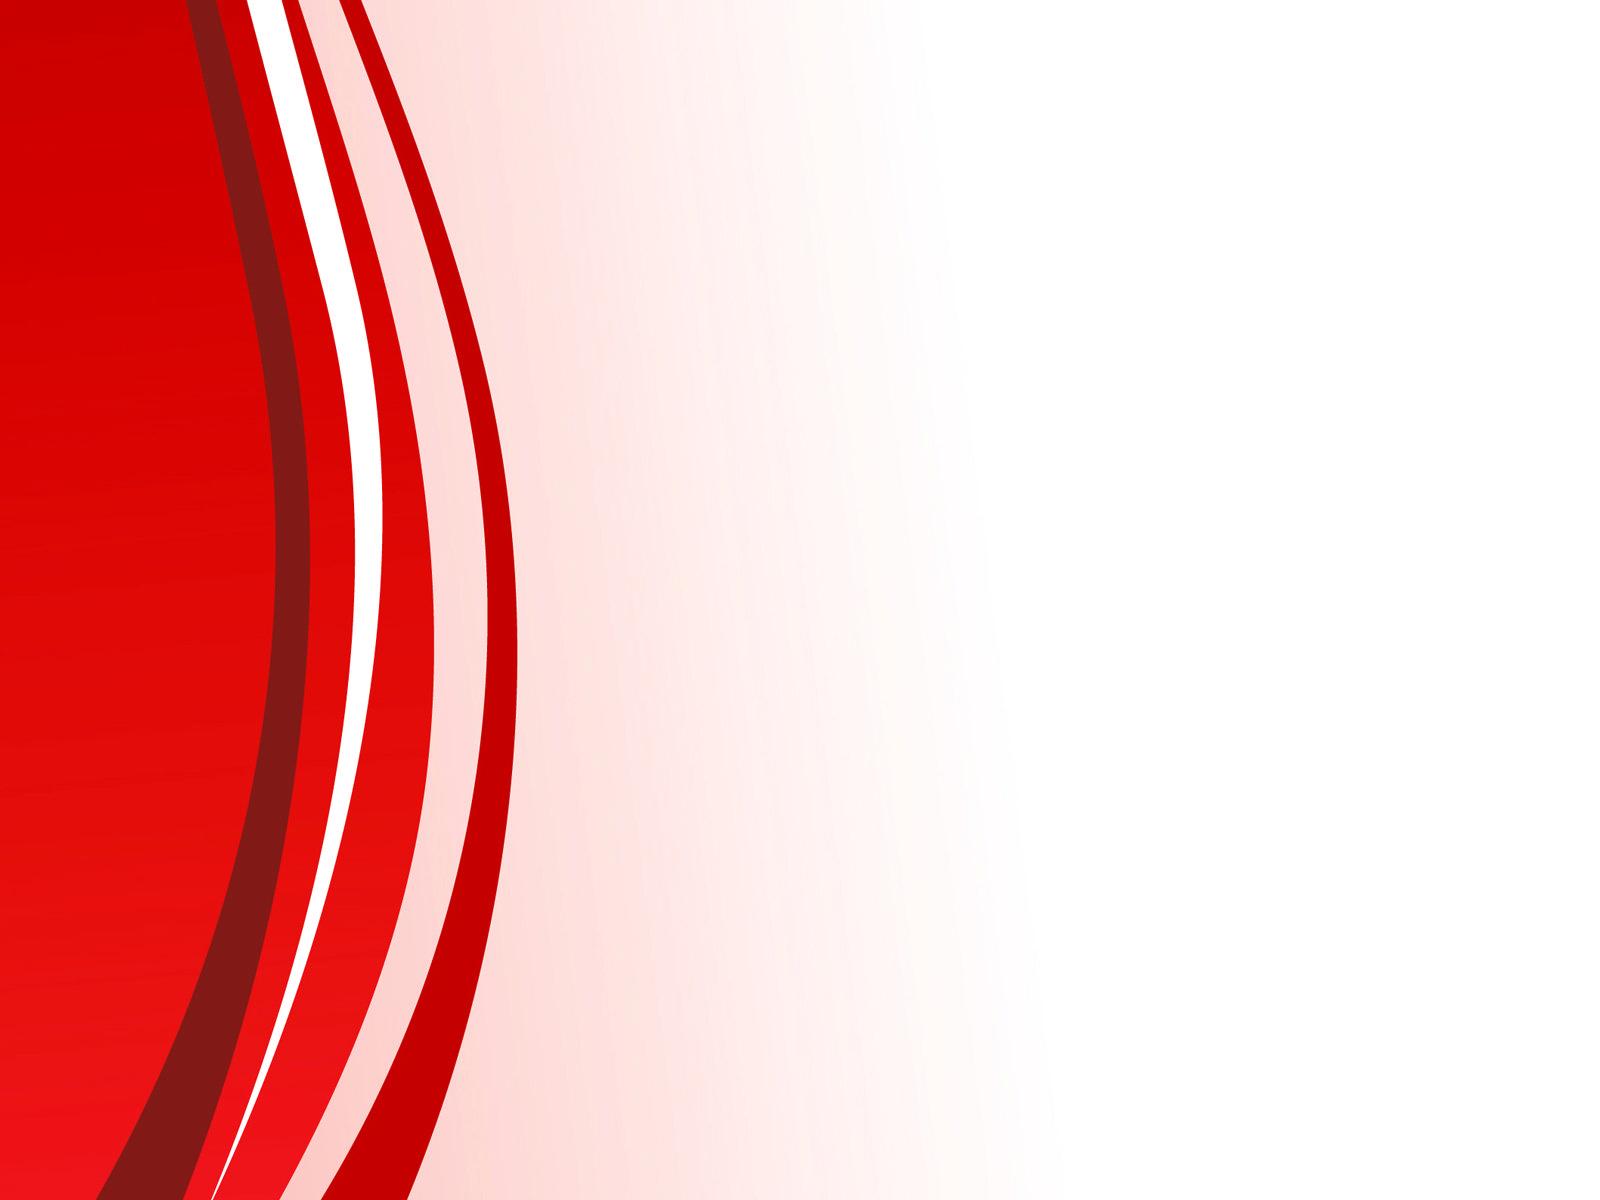 Next Stop Pinterest White Background Wallpaper Red And White Wallpaper Black Background Wallpaper